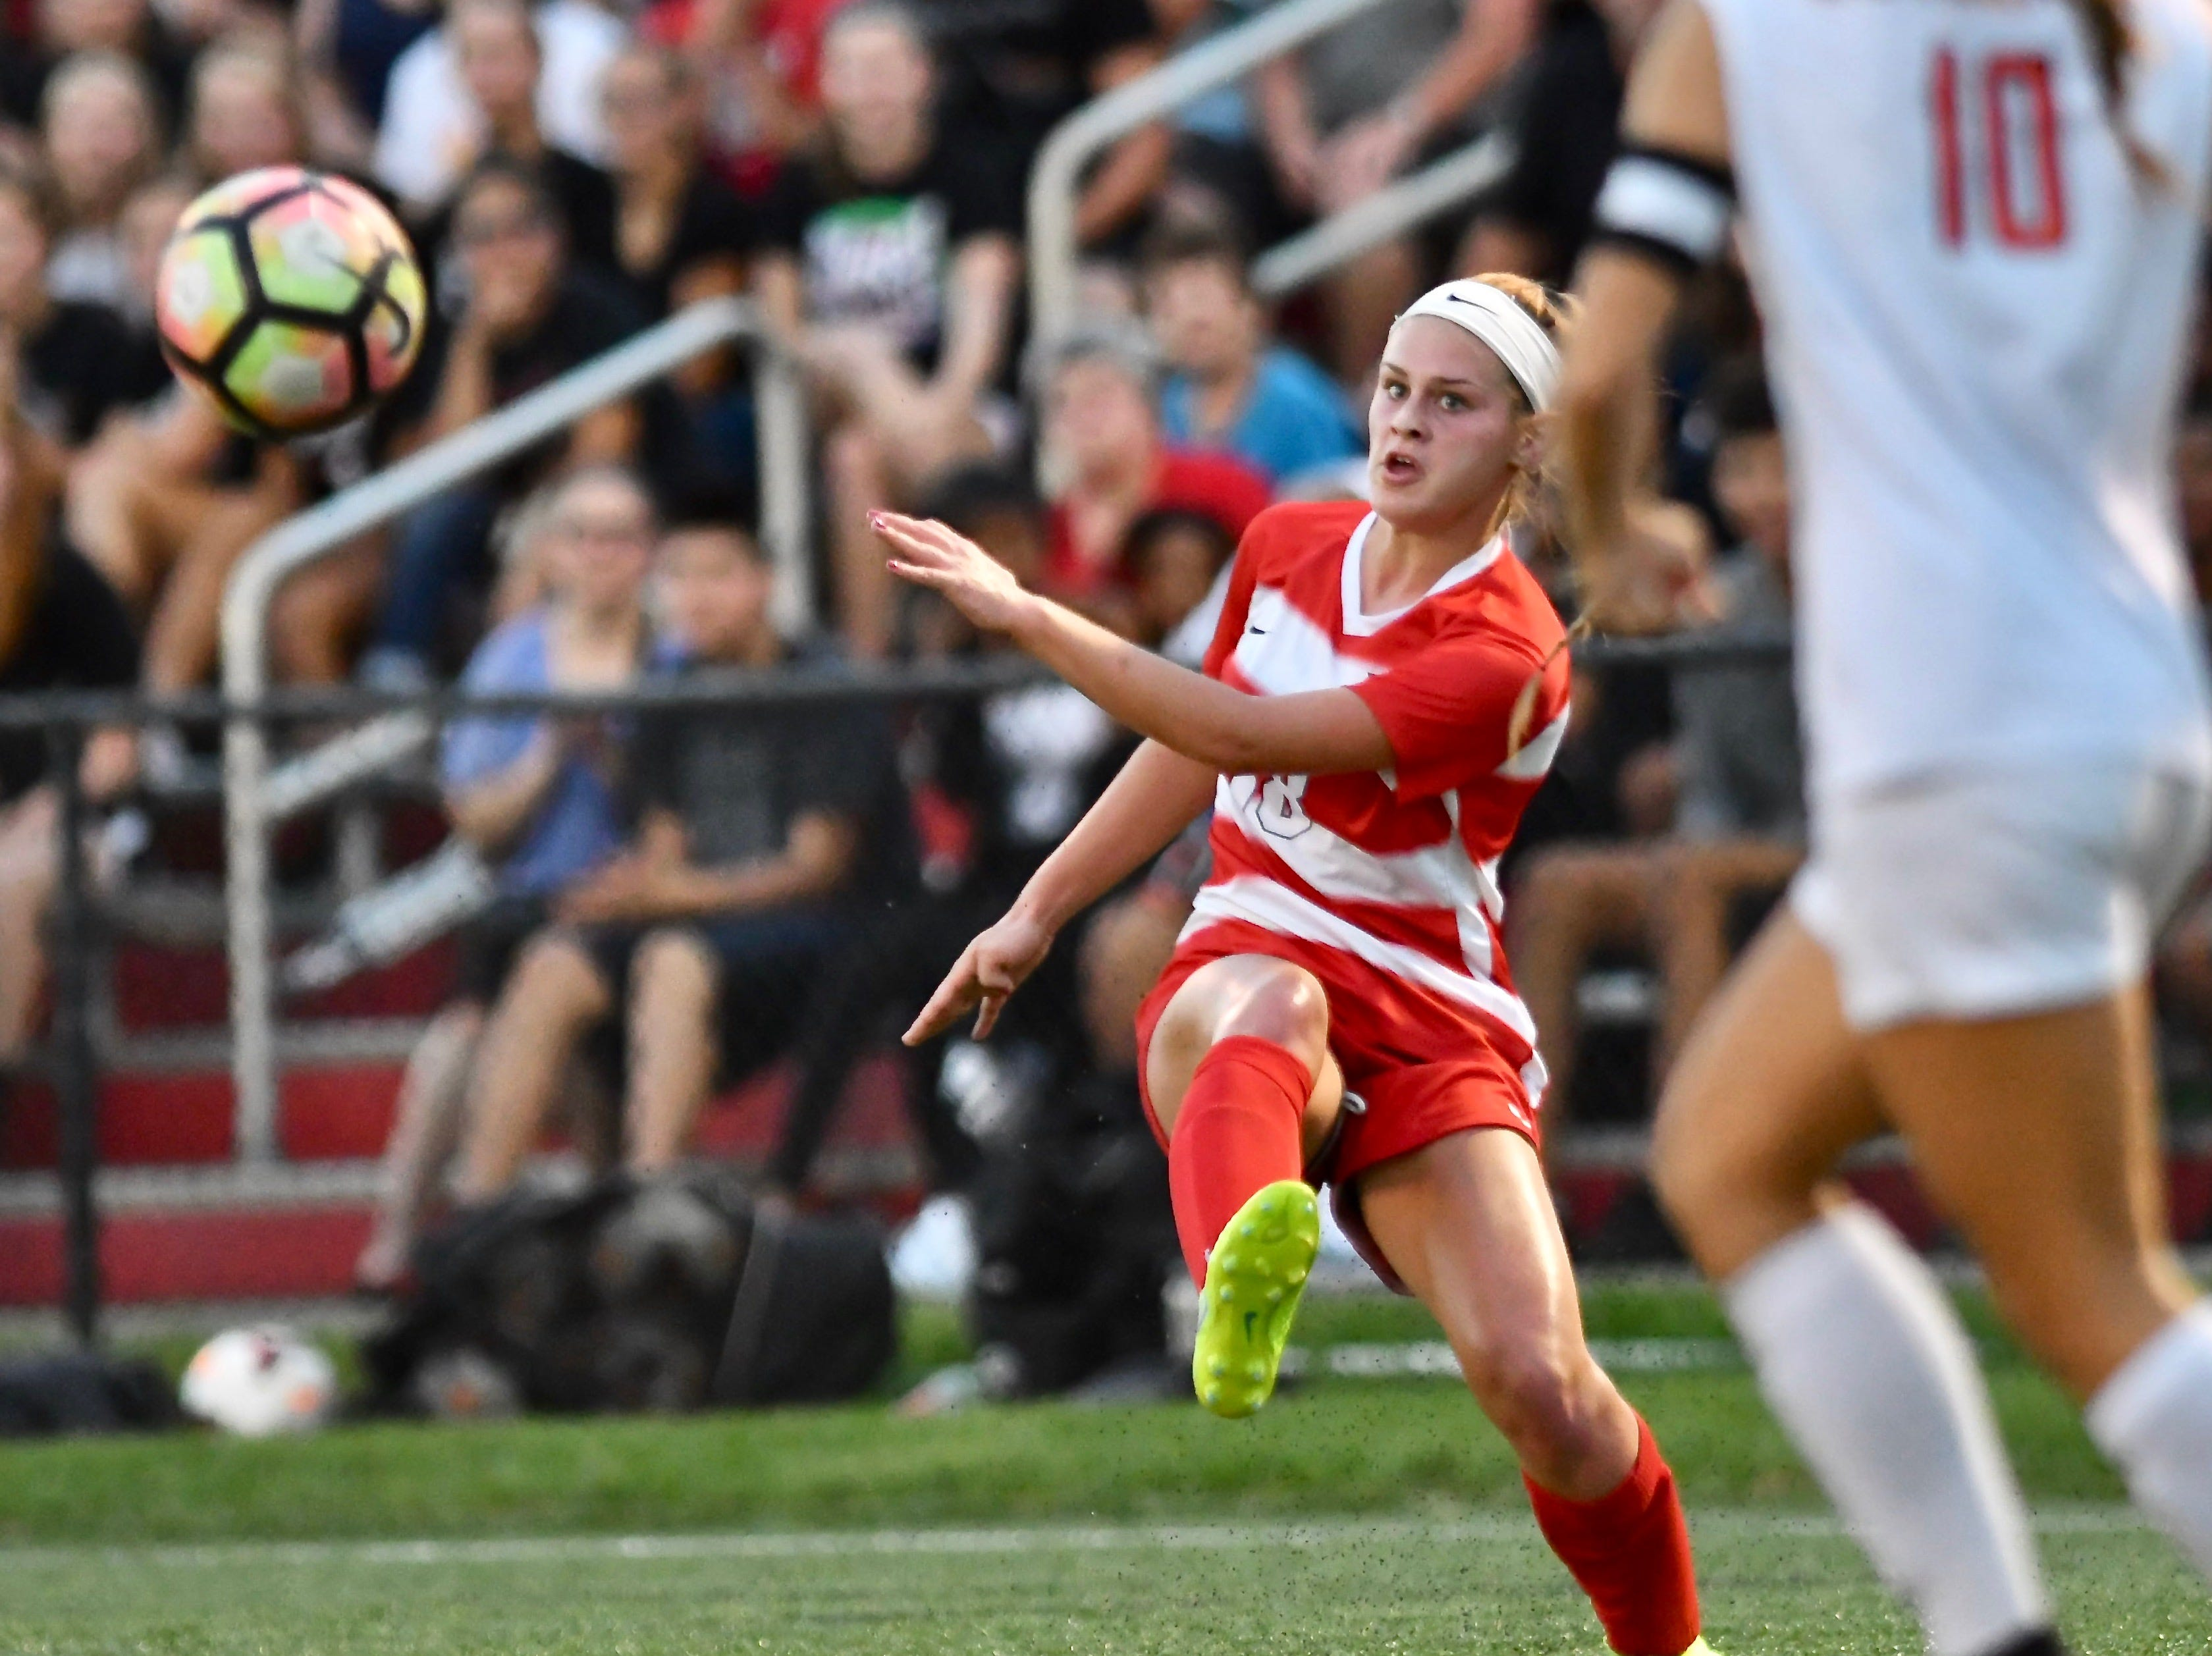 Fairfield's Isabelle Wissel crosses a ball into the Loveland box Thursday, Sept. 20, 2018 in Fairfield, Ohio